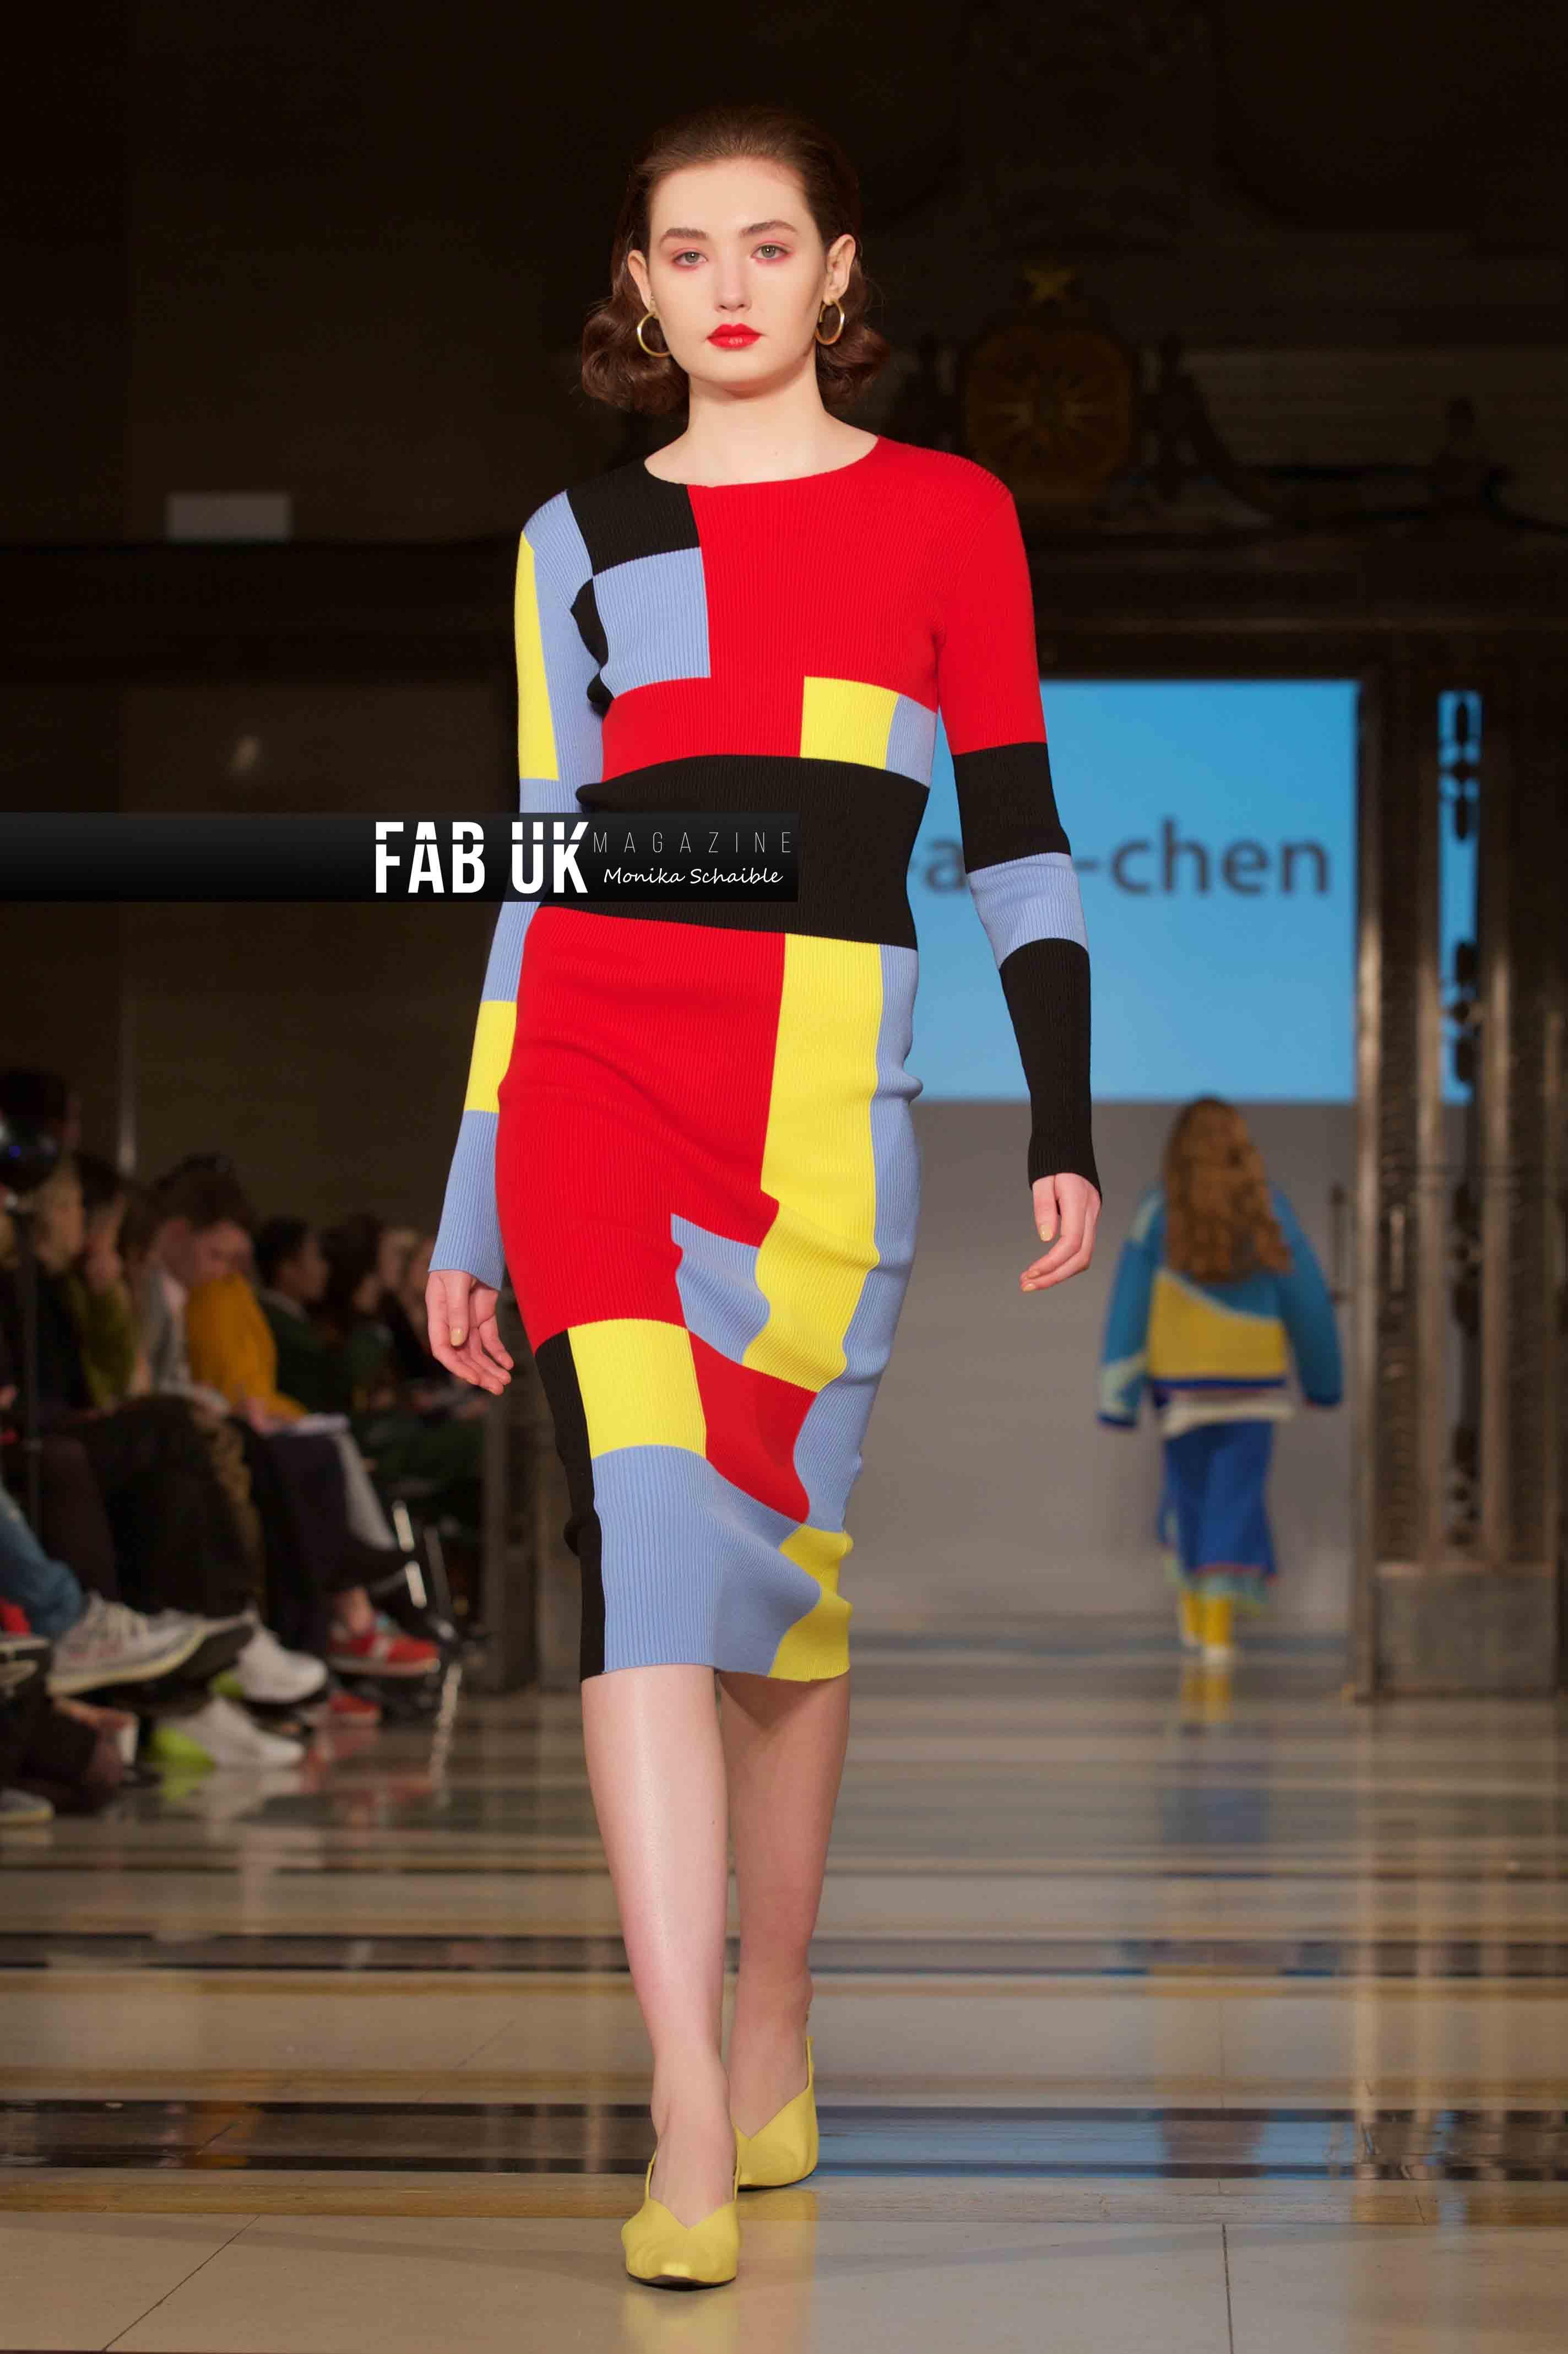 fashion scout, feb 2019, designer i am chen, monika schaible